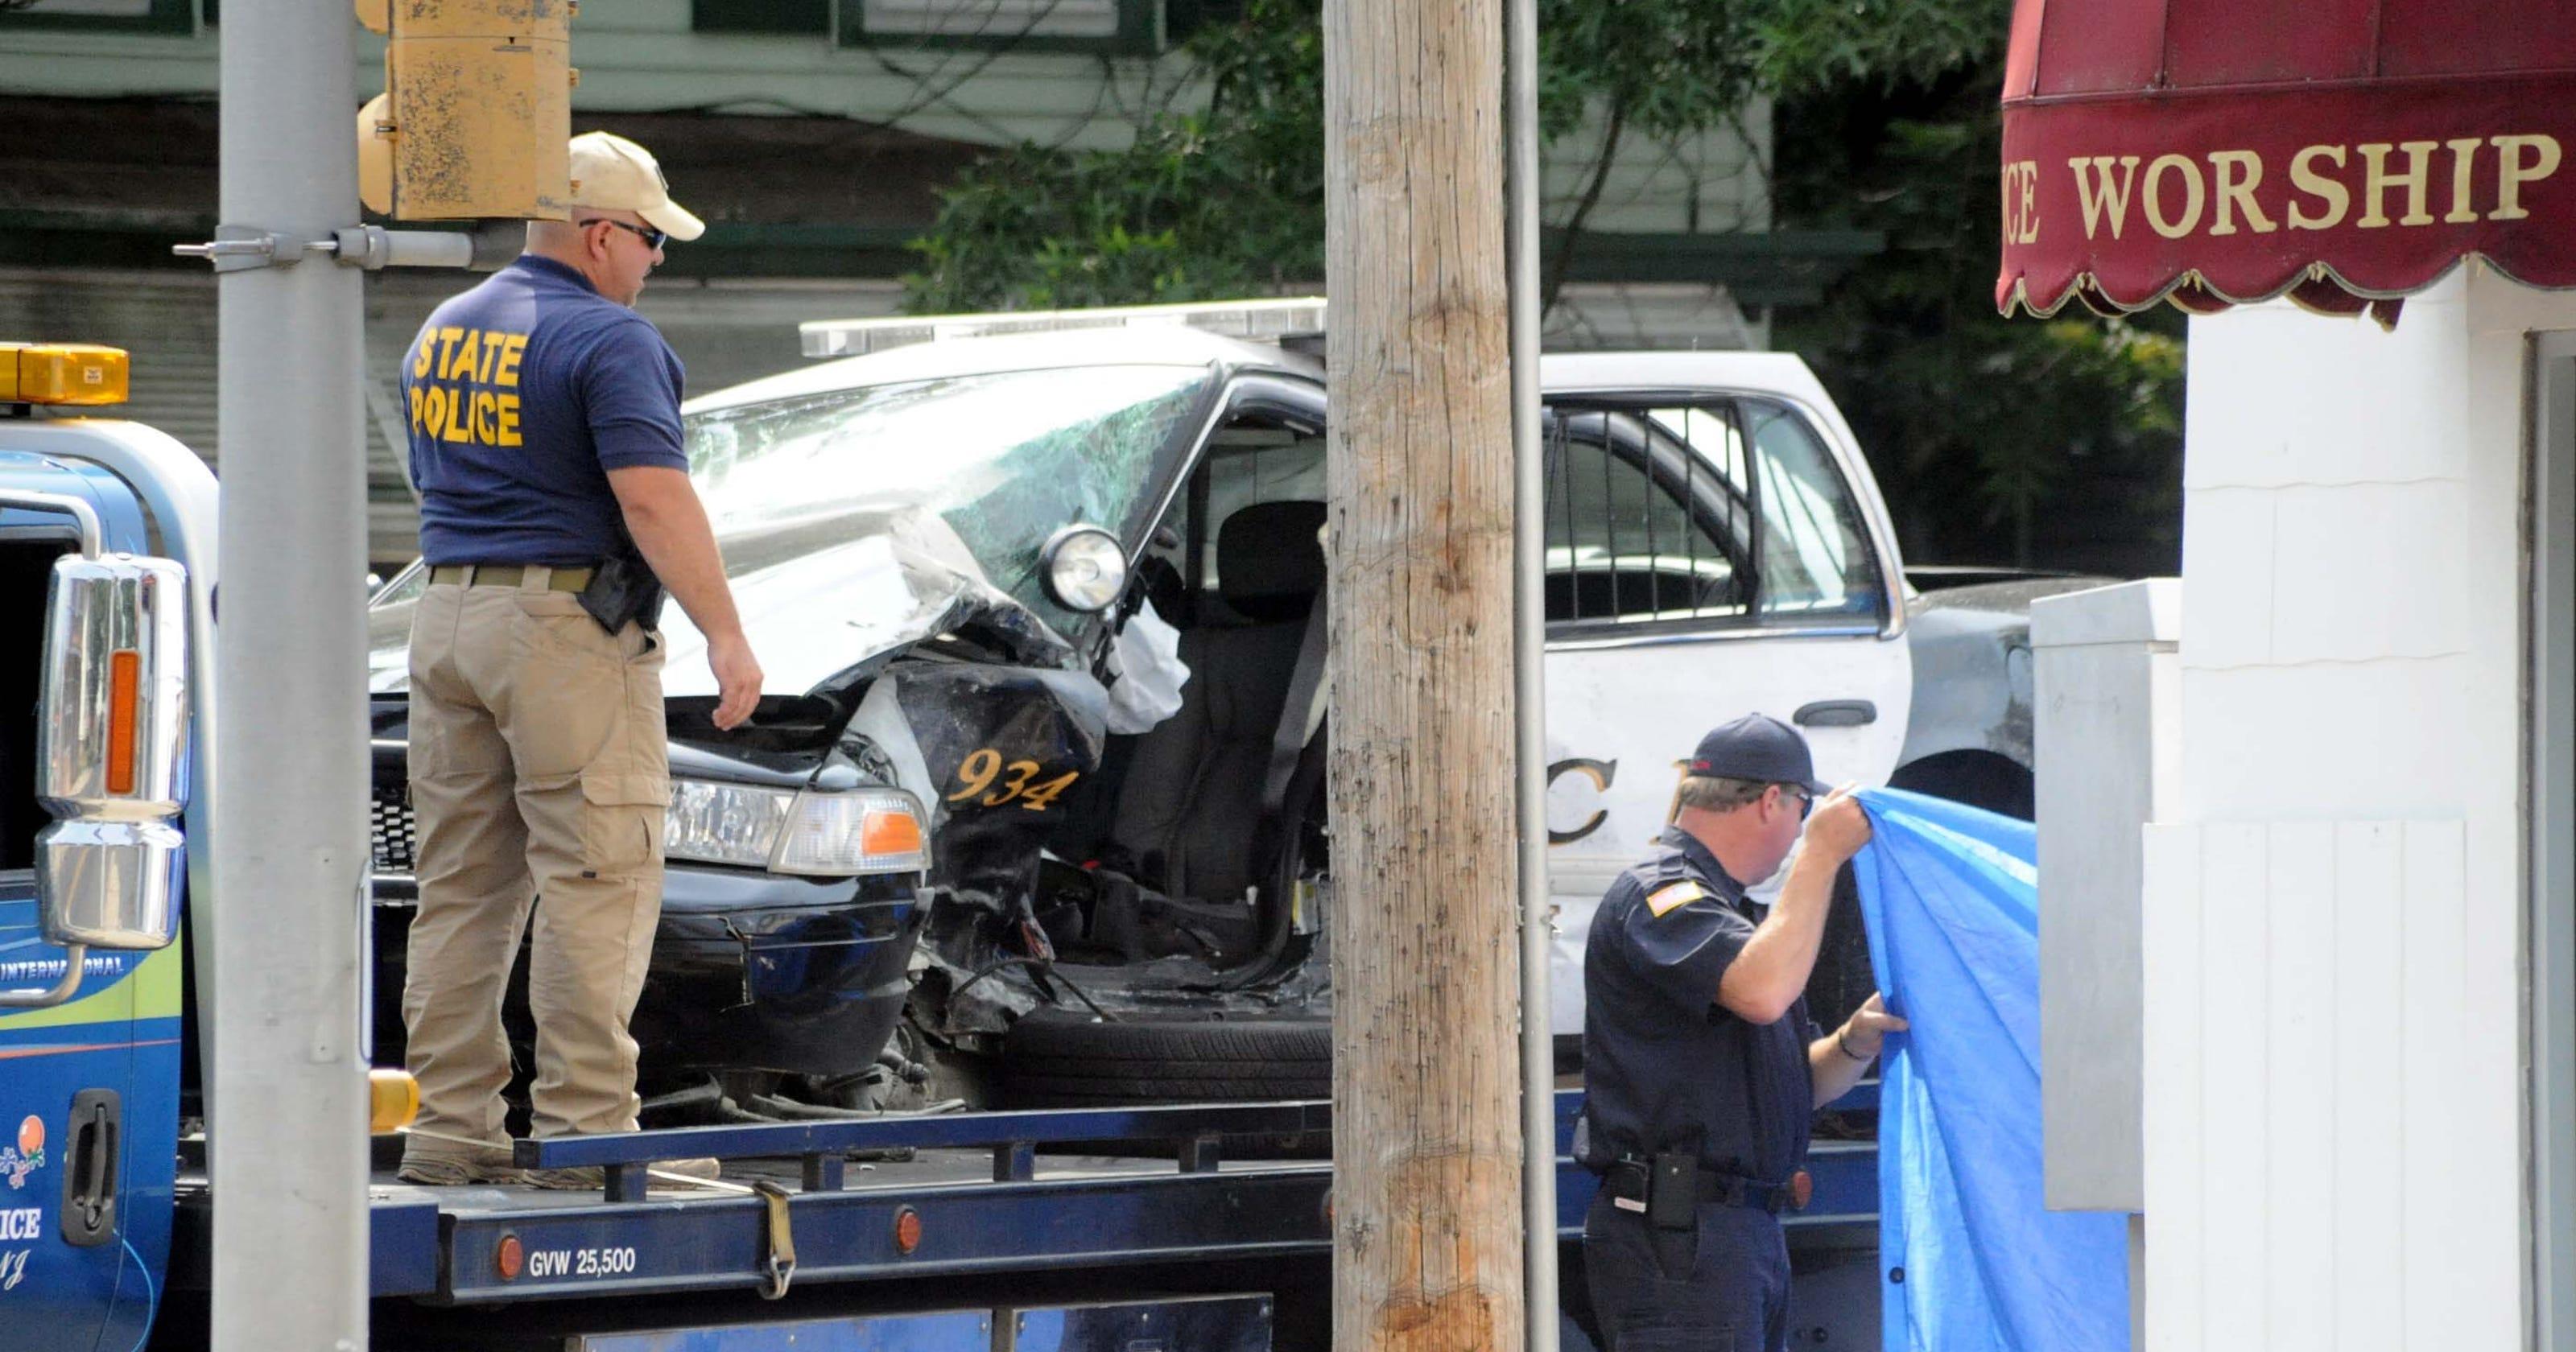 FBI vastly understates police deaths in chases